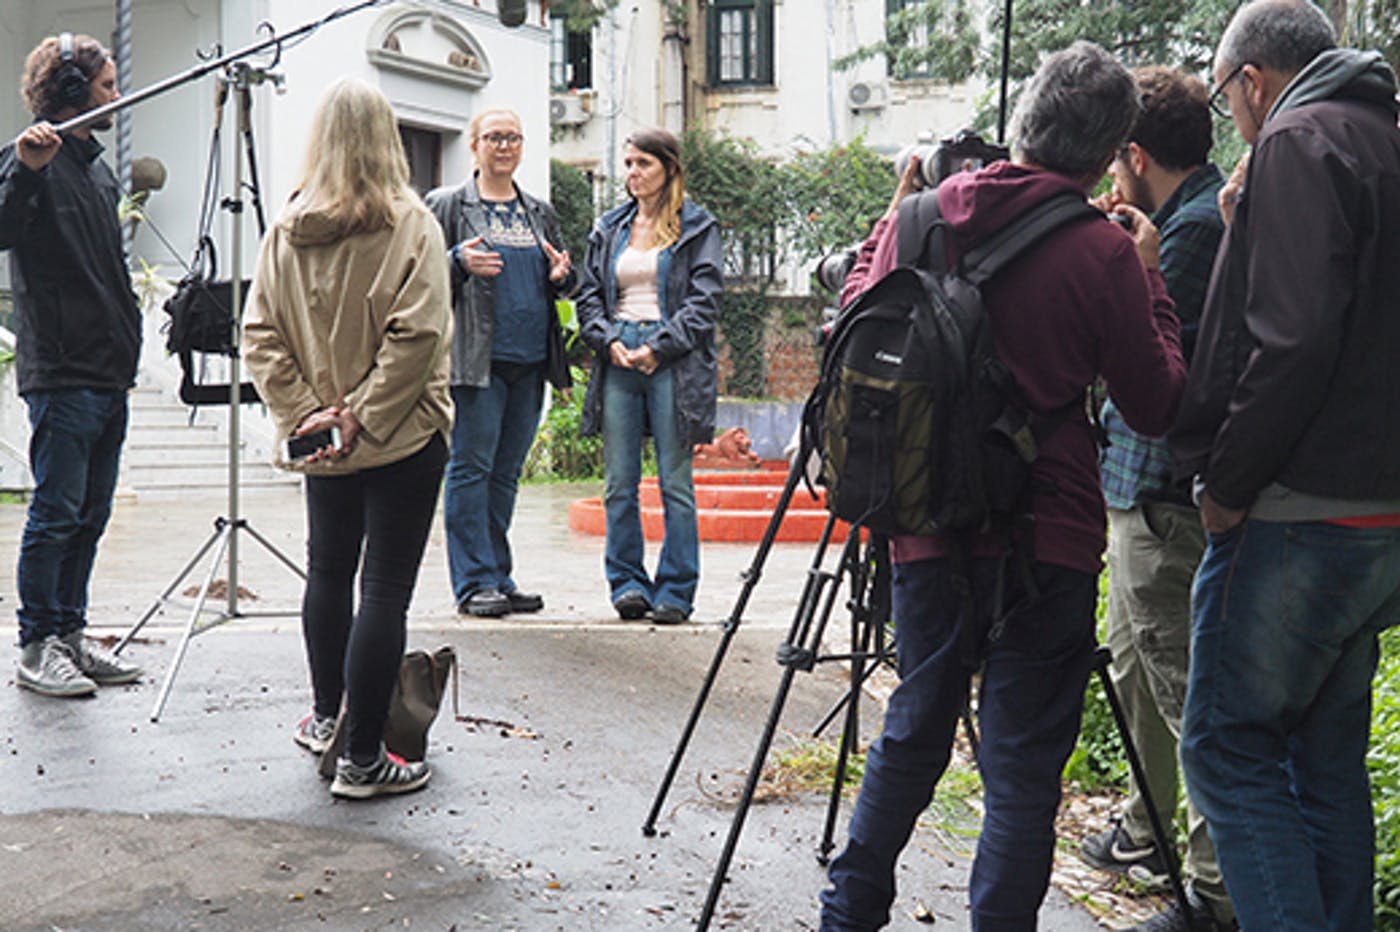 520 Dokumentarfilmopptak Uruguay Lene Cecilia Caballero Jeske Foto Ulf Breistrand